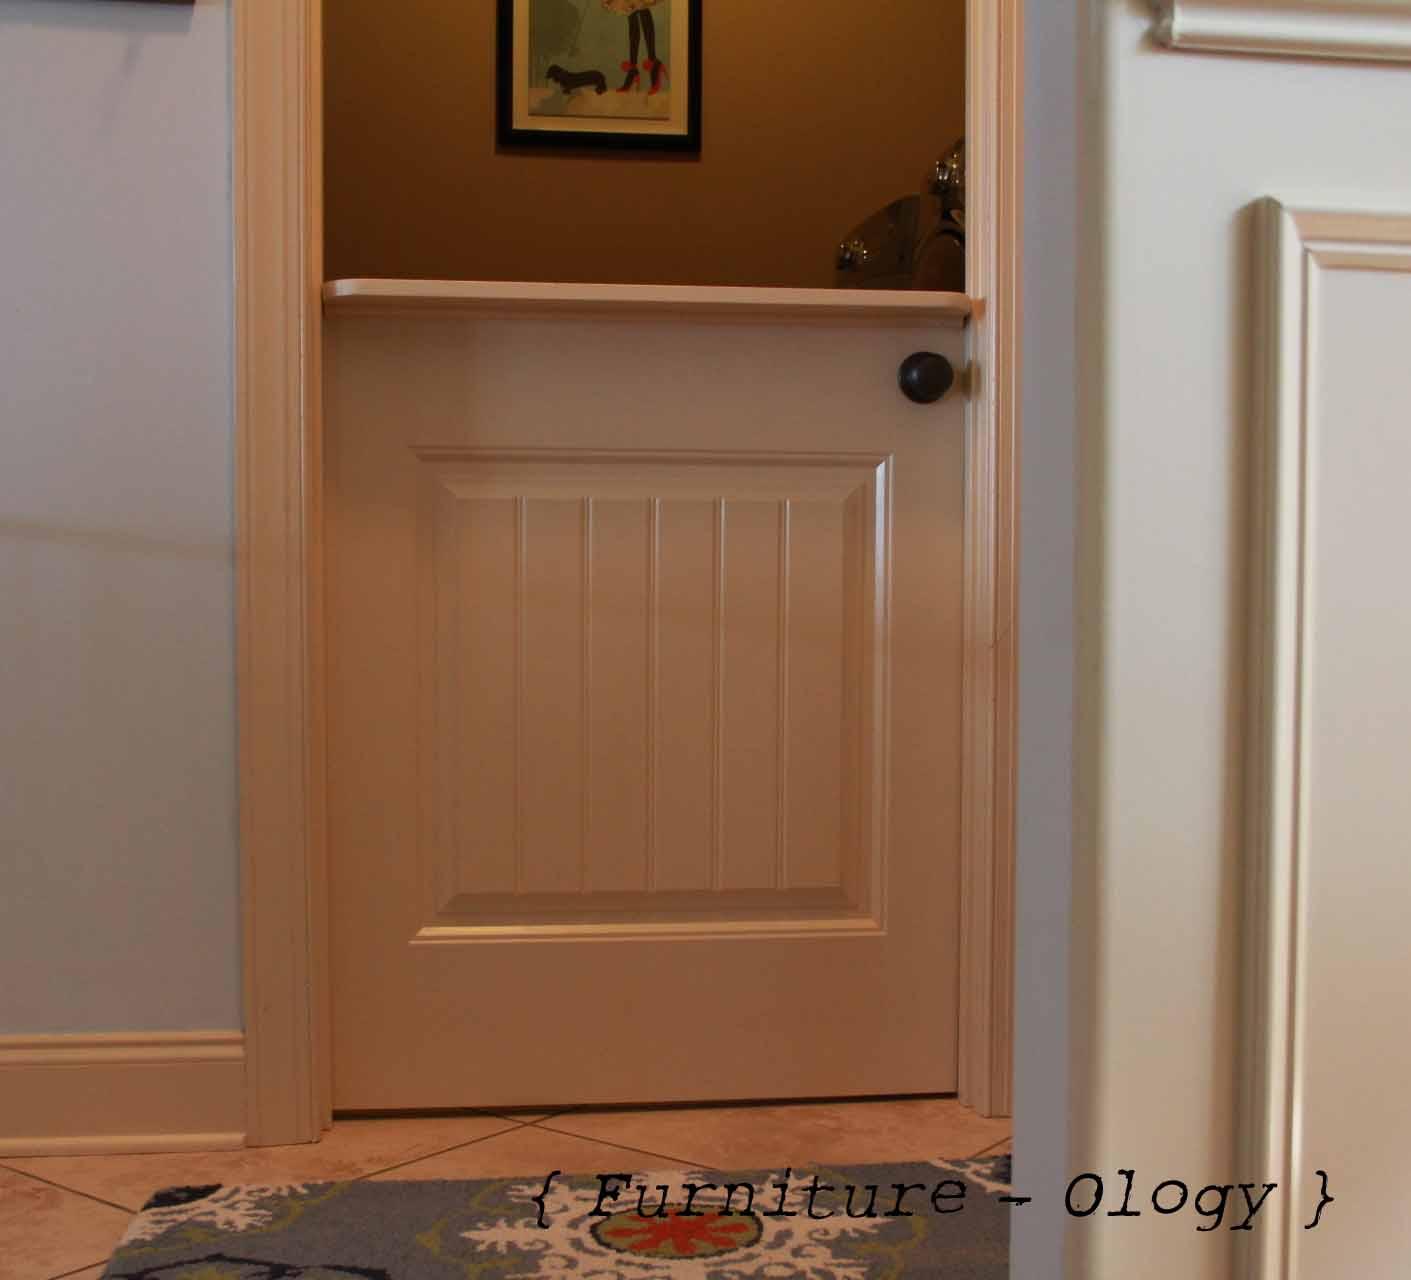 Dutch Door Baby Gate Furniture Ology When One Door Closes Another One Opens